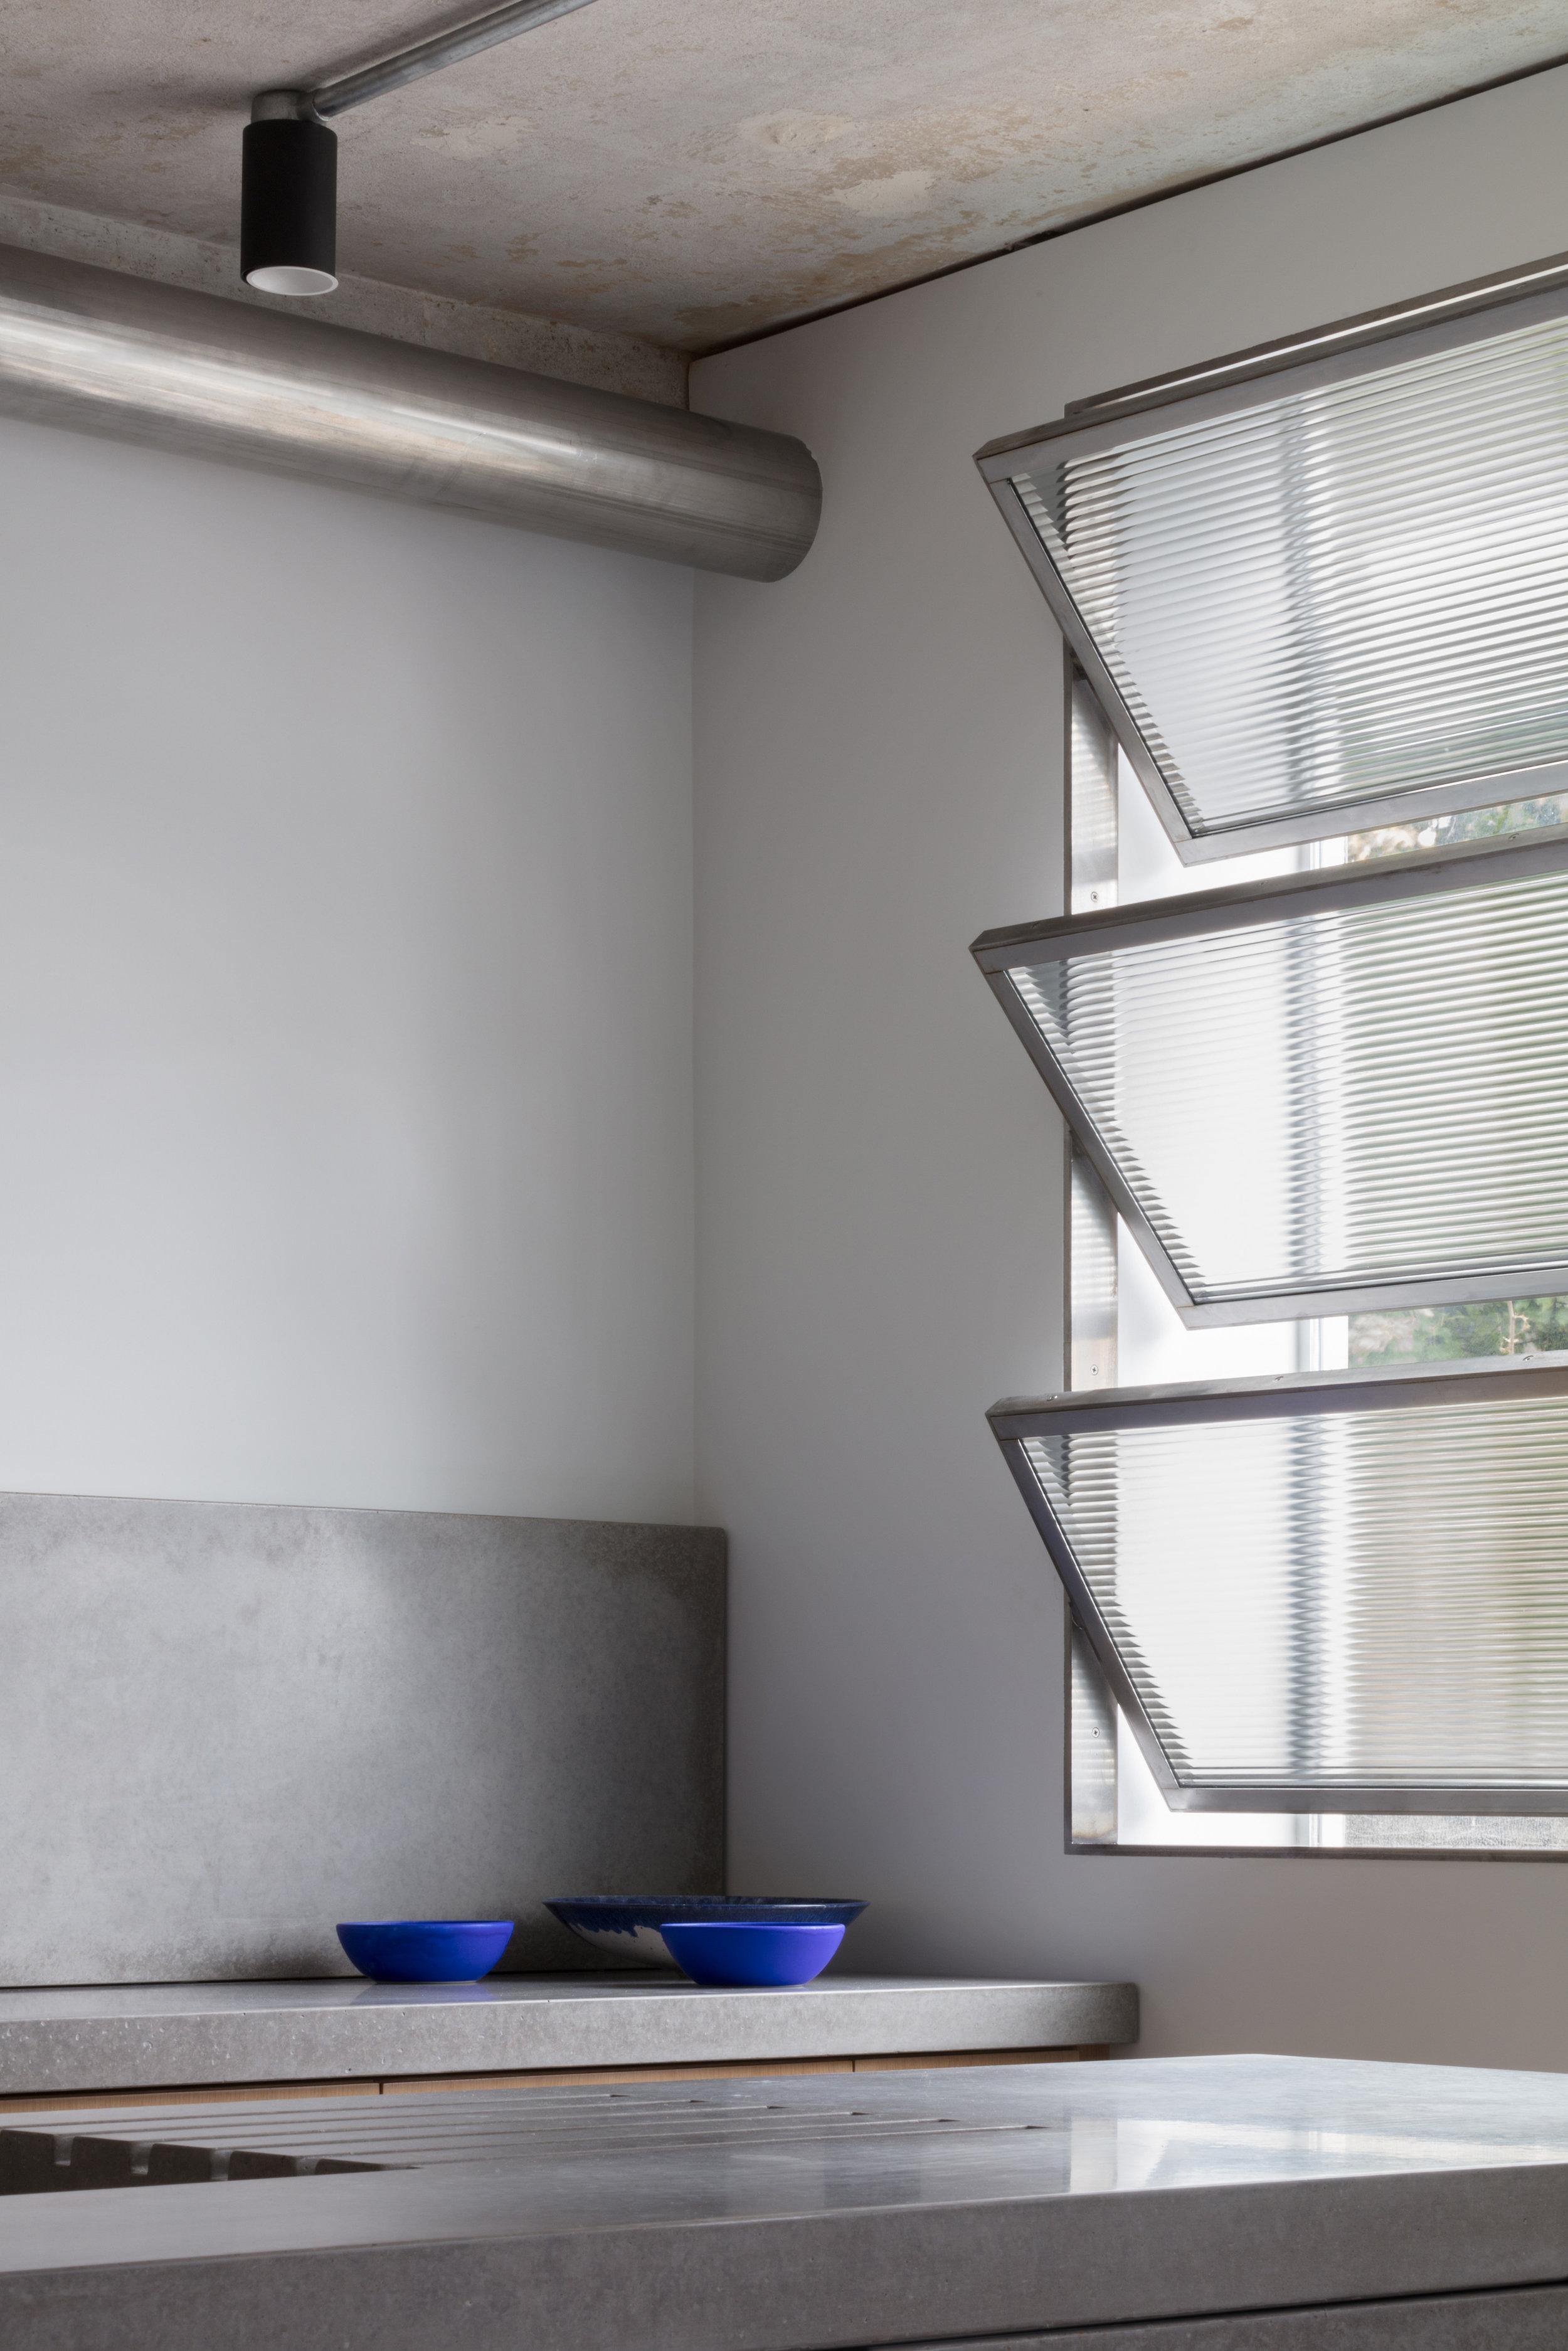 Union-Wharf-Islington-London-Concrete-Shutters-Kitchen-Interior-Residential-Architect.jpg